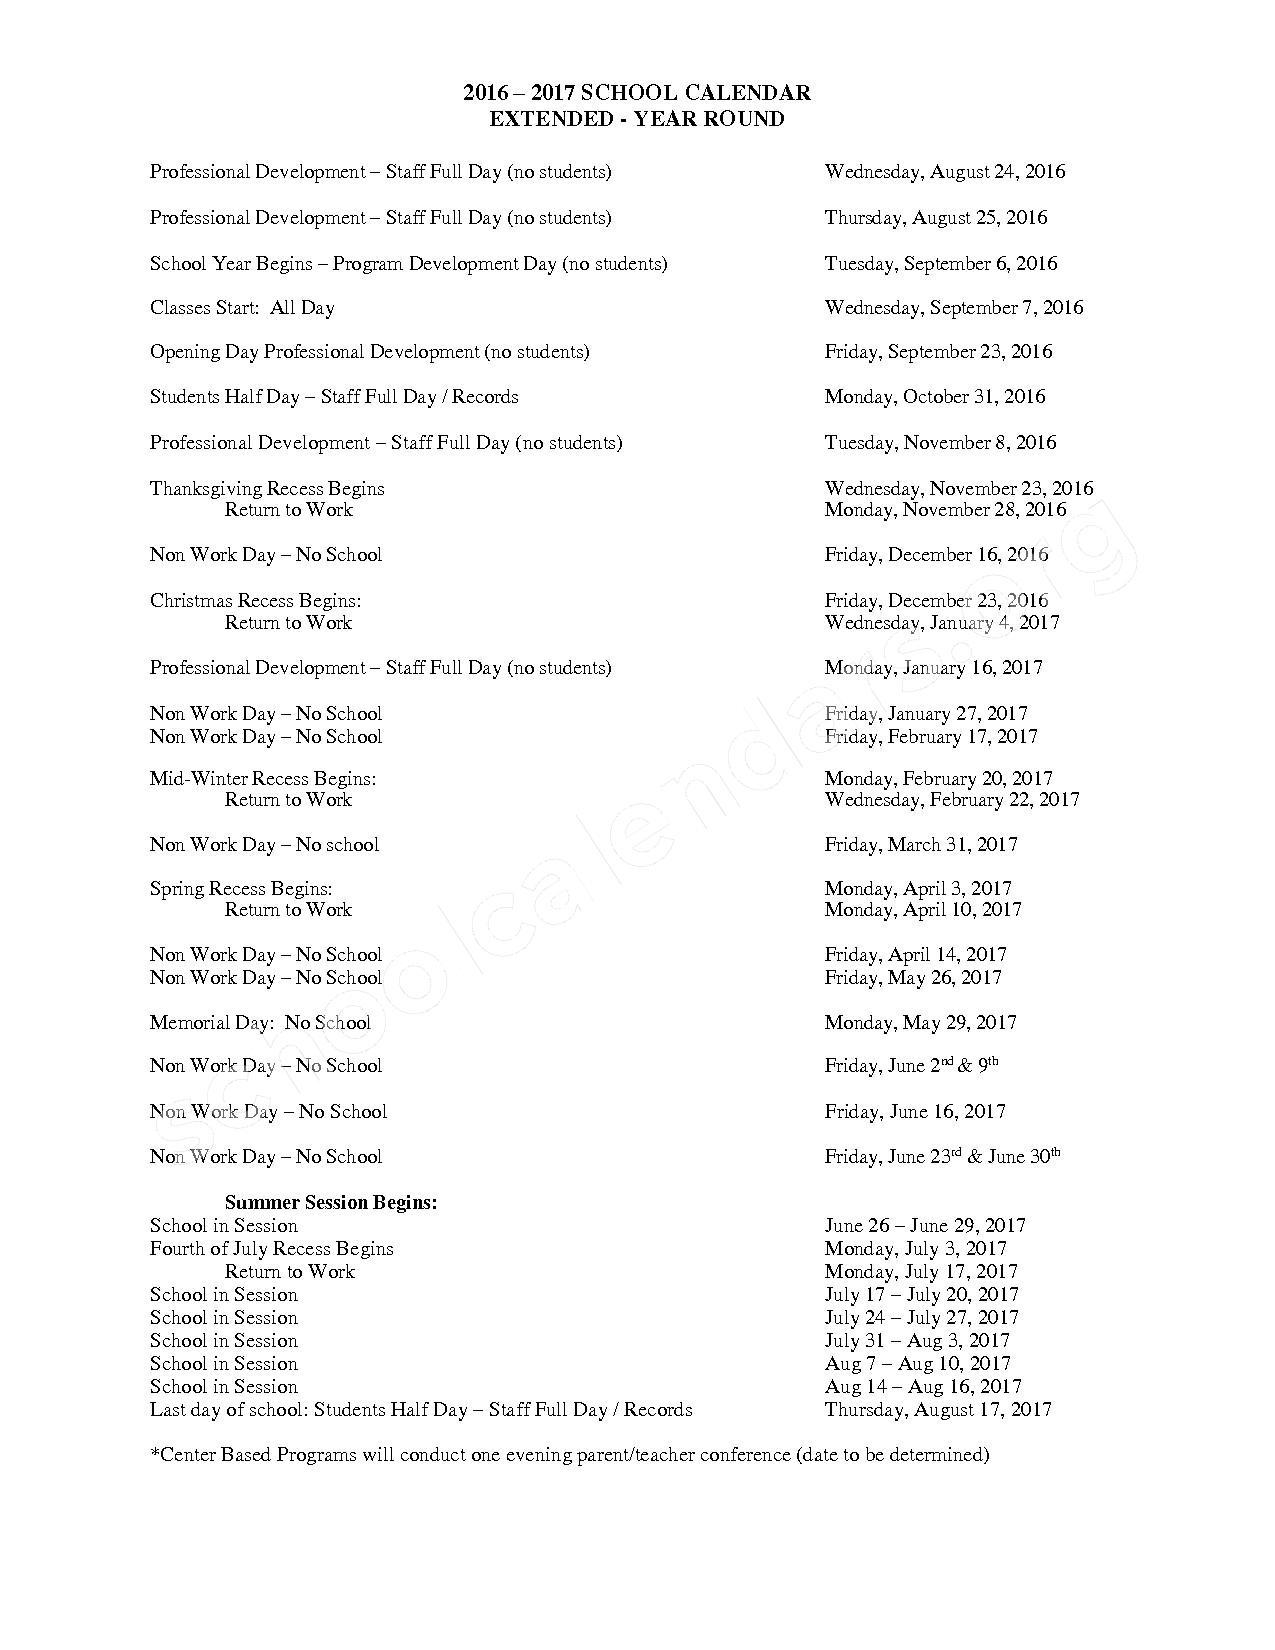 2016 - 2017 School Calendar – Roseville Community Schools – page 1